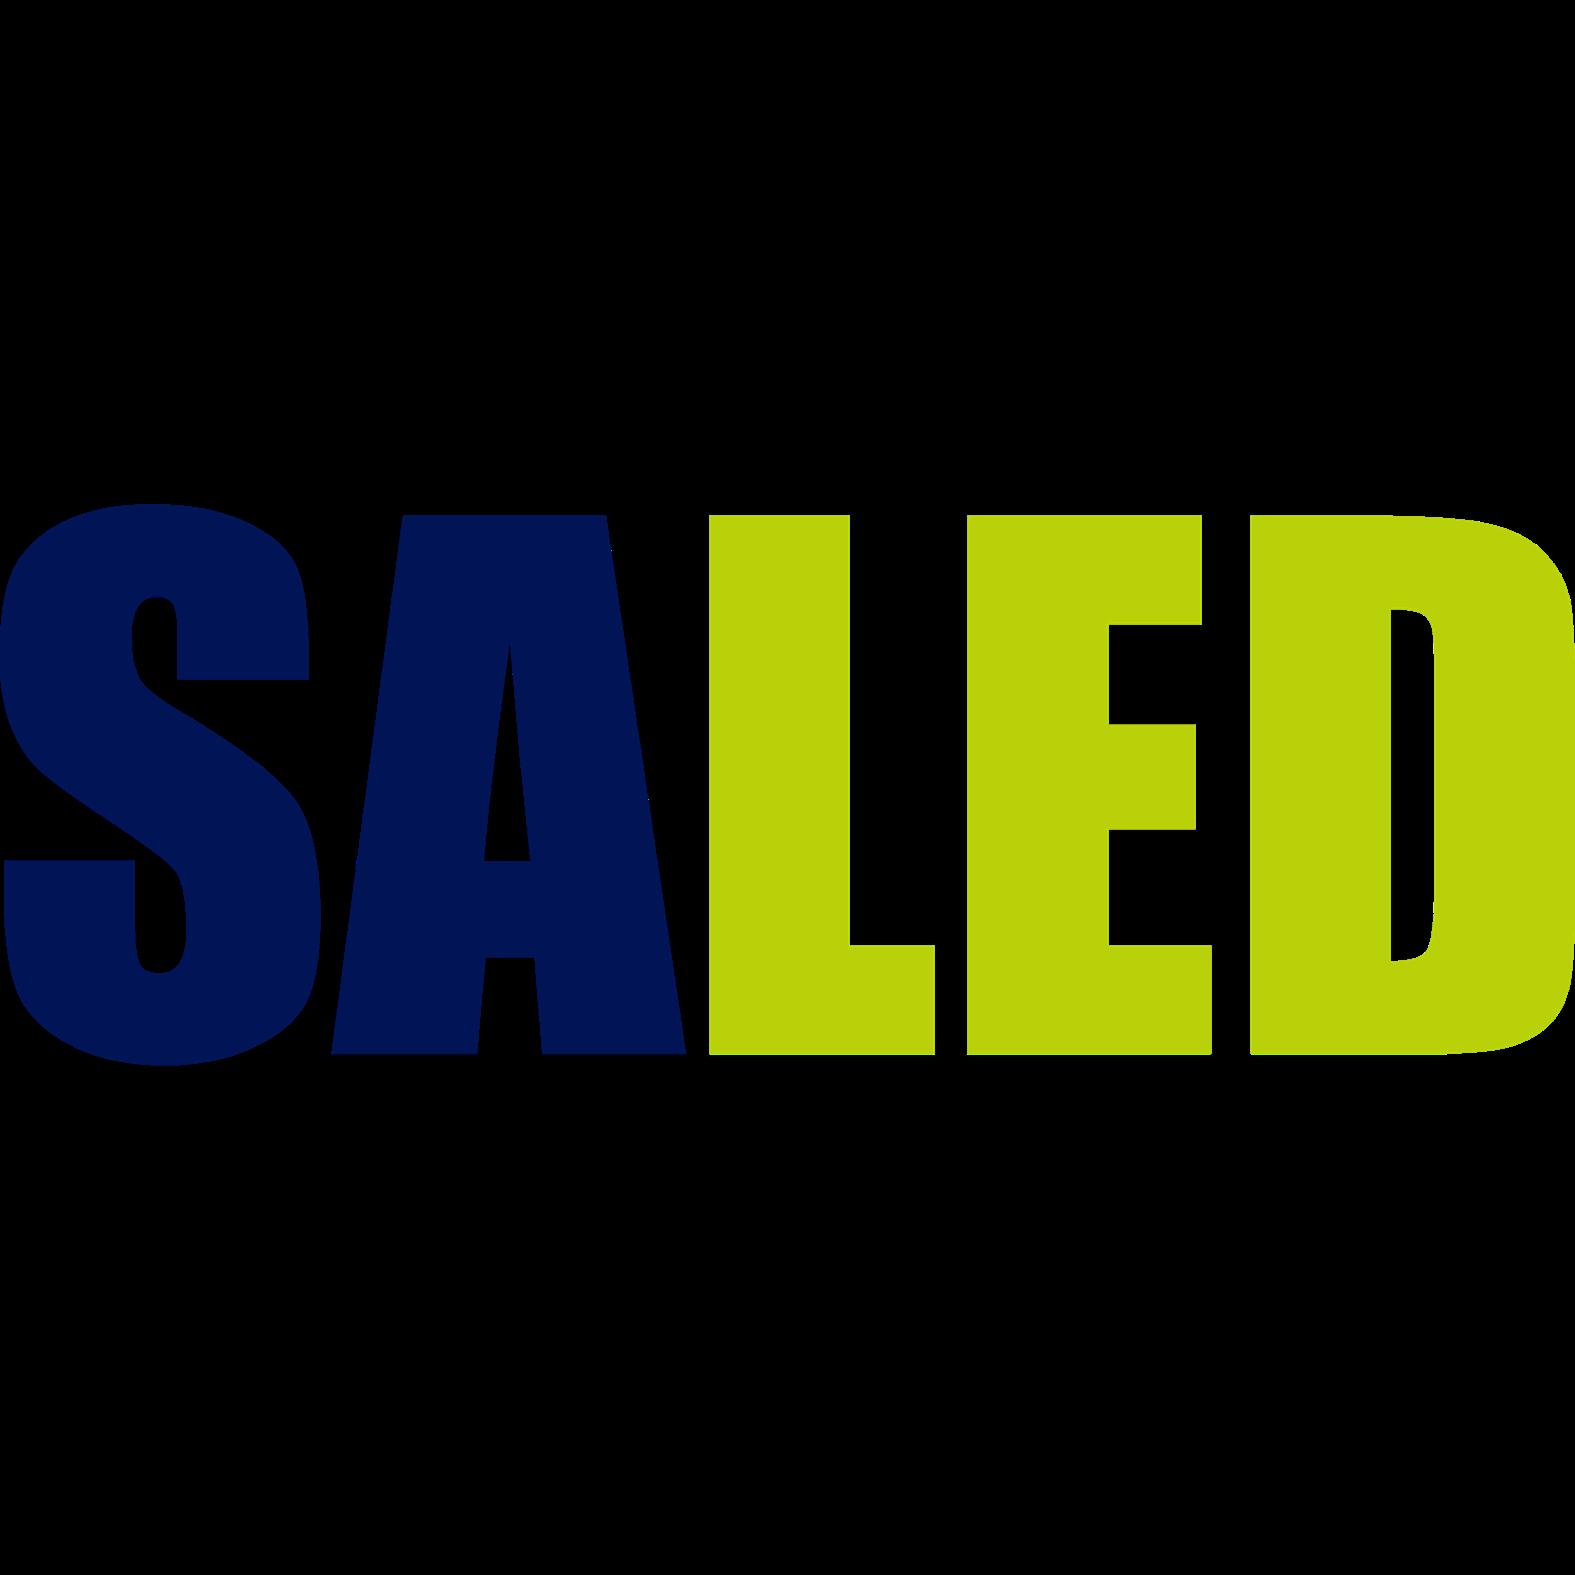 Saled